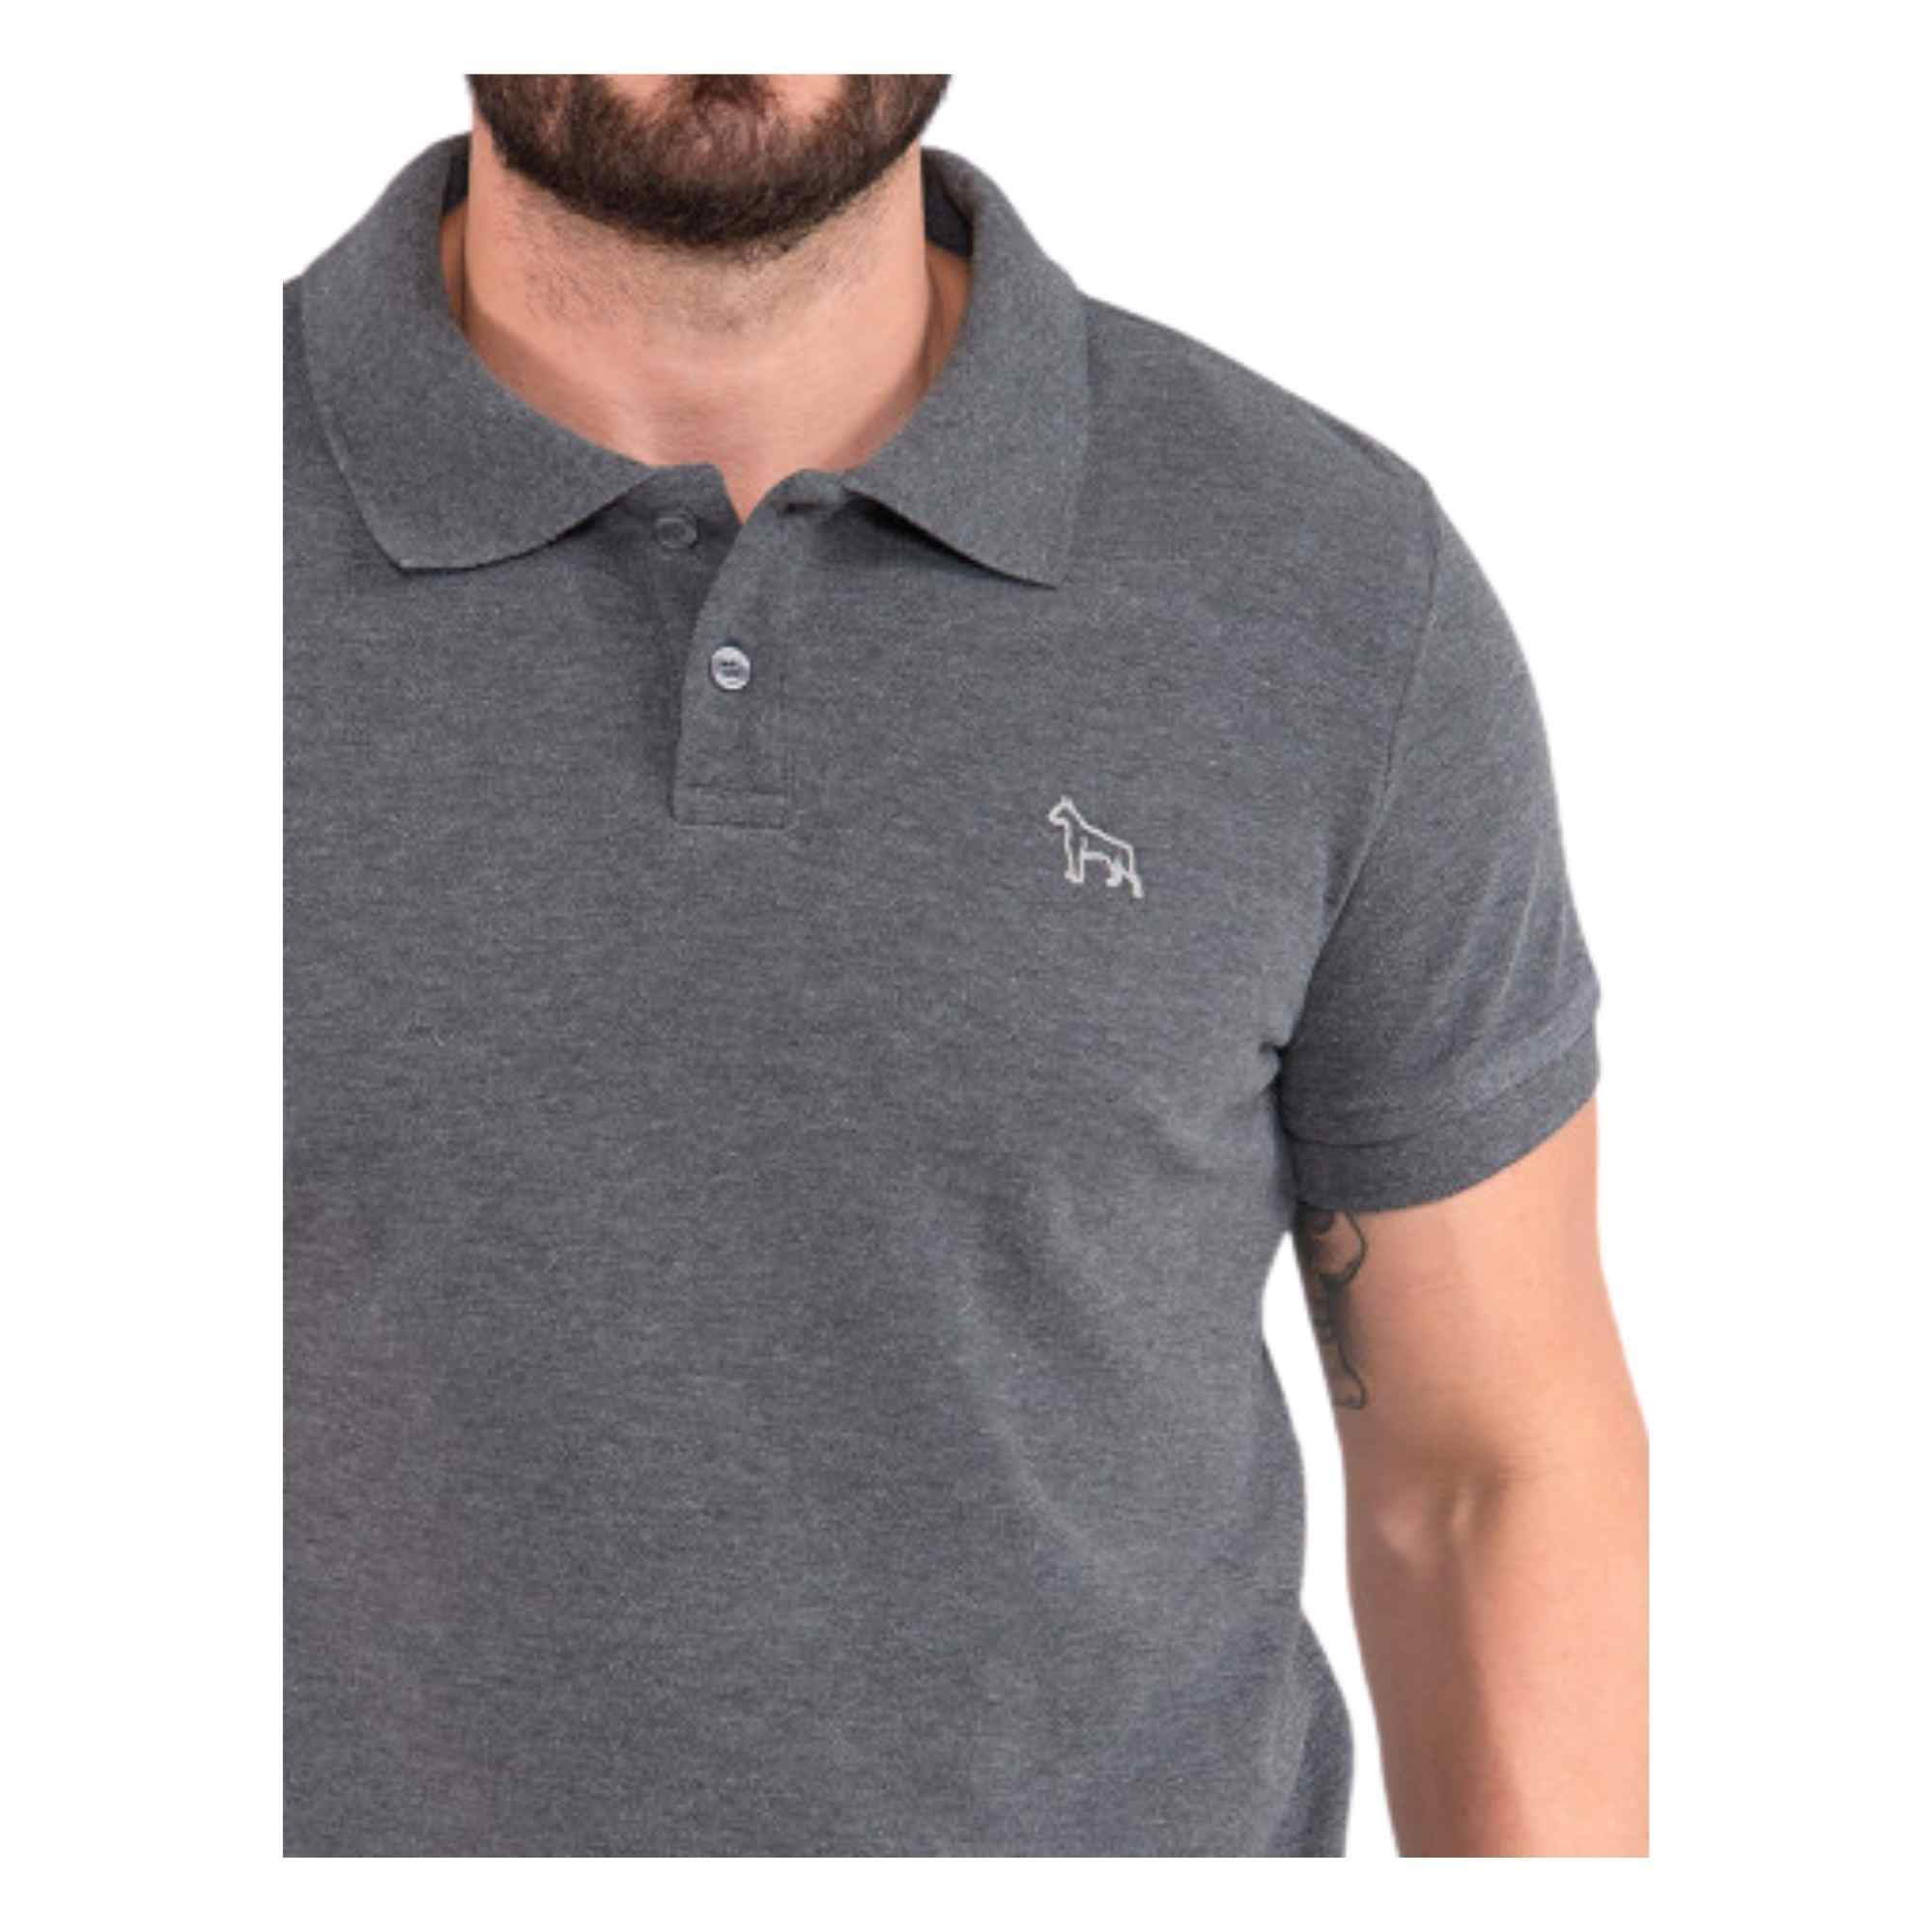 Camiseta Revanche Polo Basica 113280 Cachorro